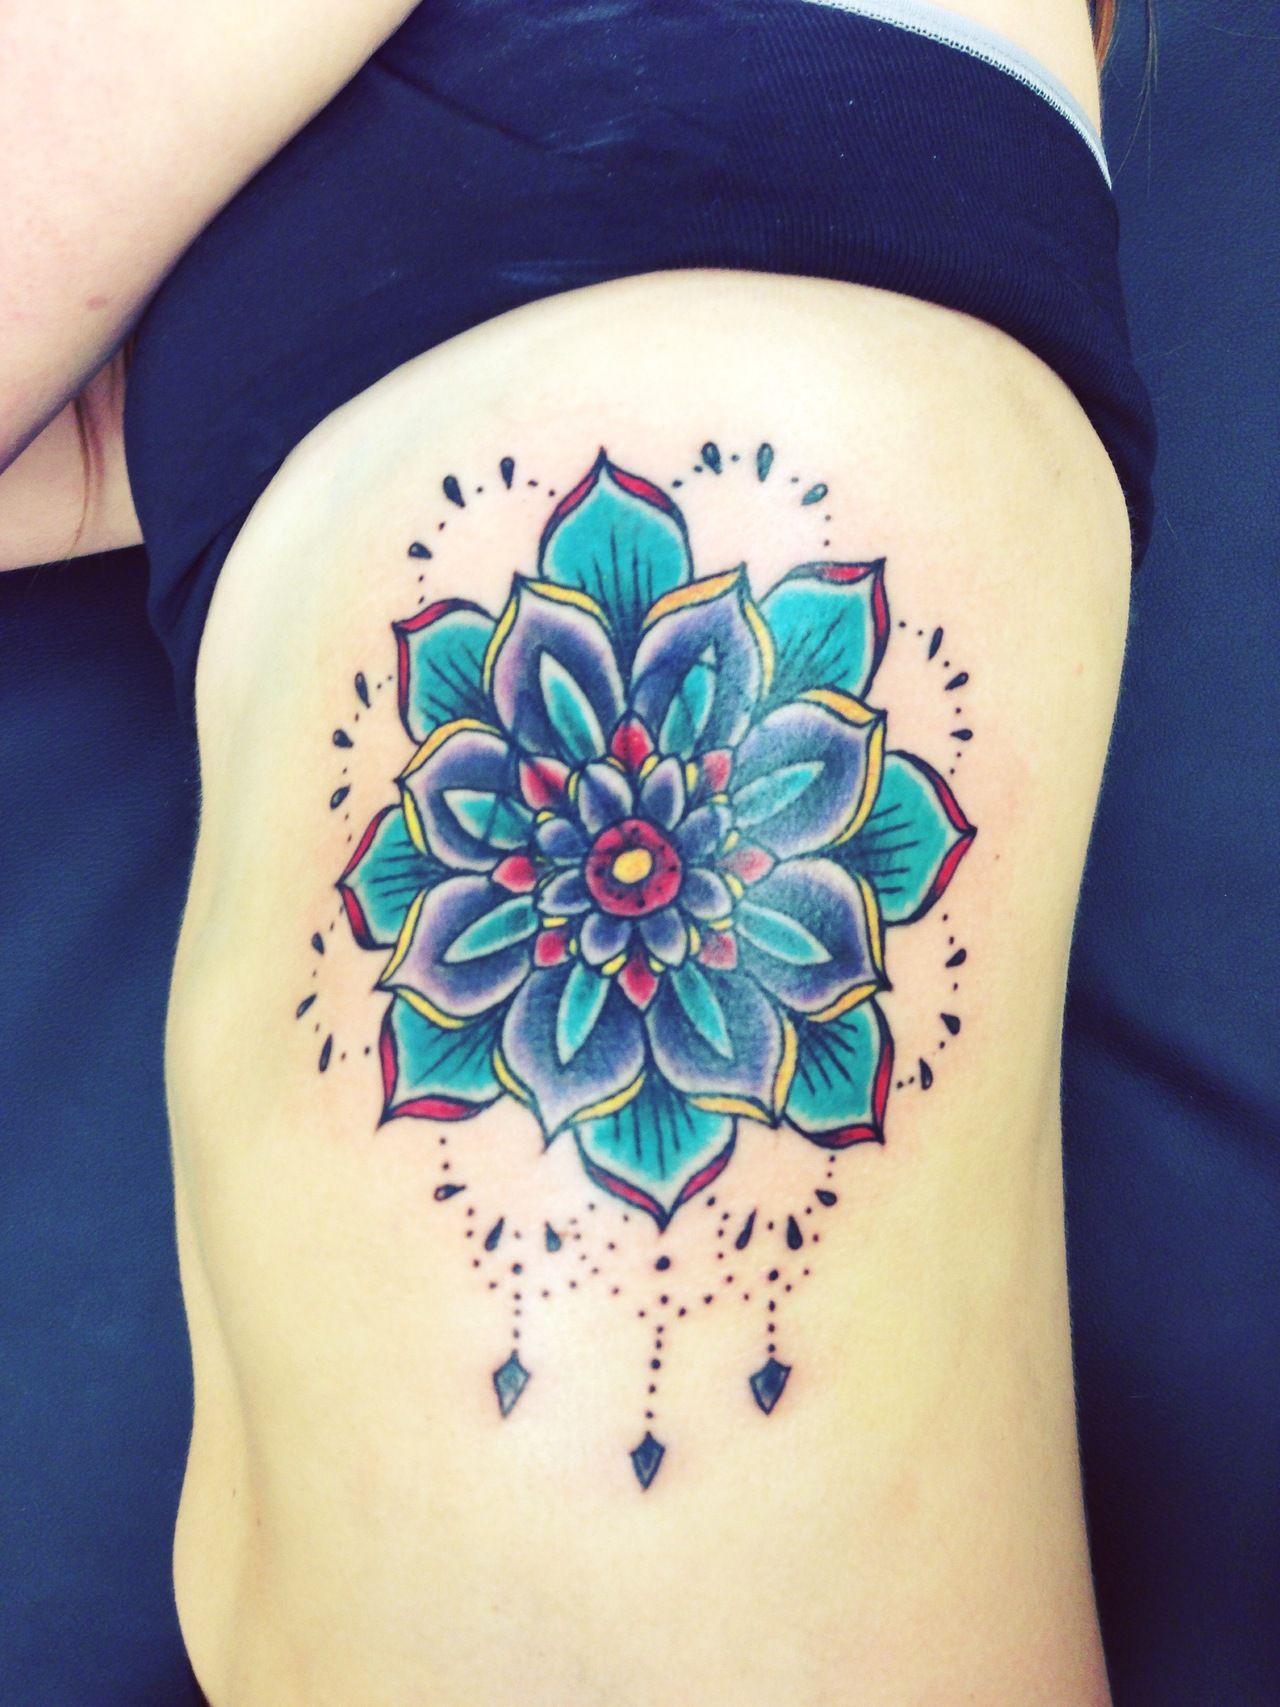 Dripping mandala side tattoo tattoos pinterest side tattoos blue lotus flower tattoo blue lotus flower means wisdom or enlightenment izmirmasajfo